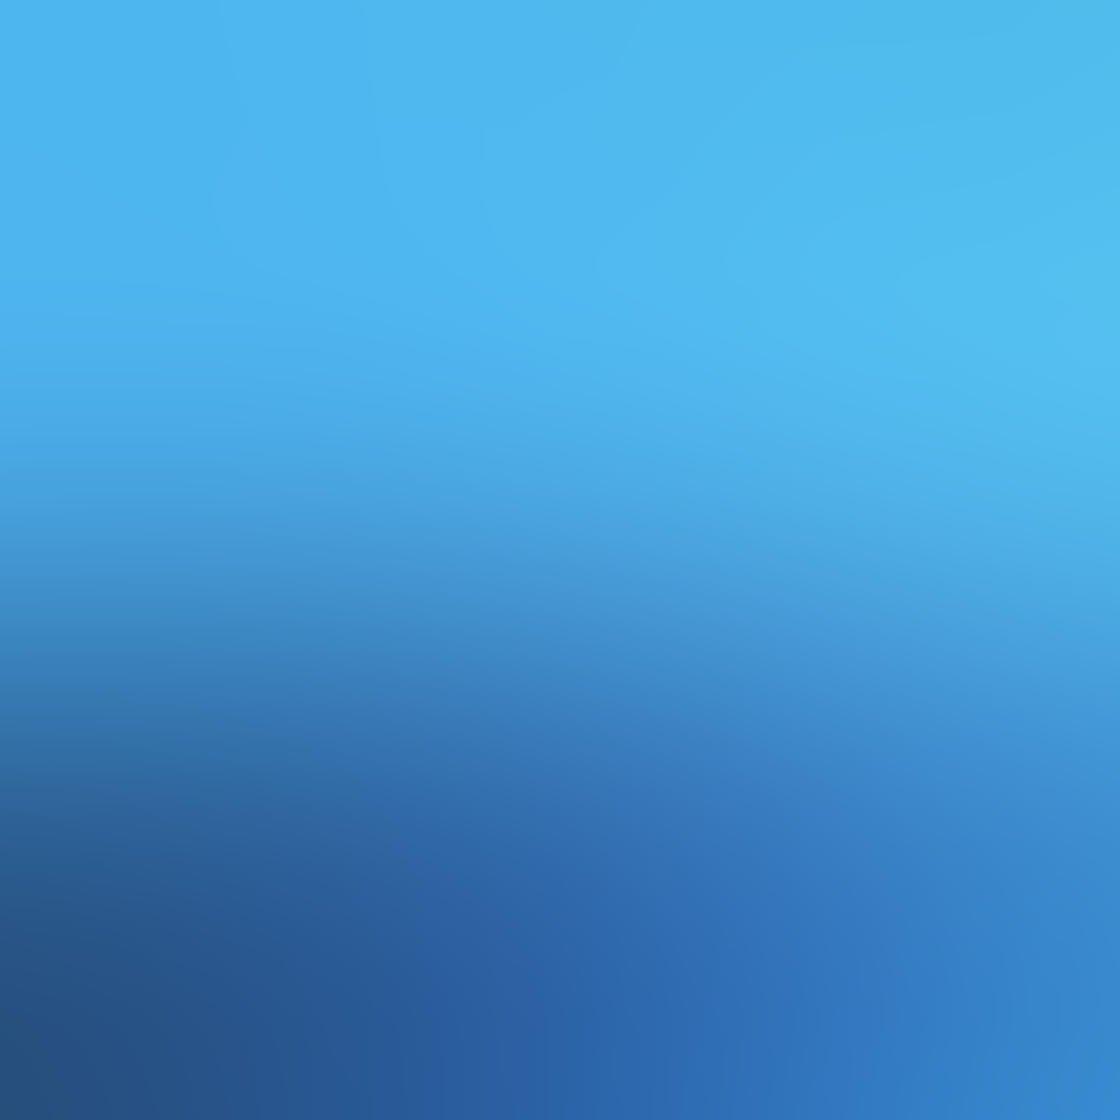 iPhone Photos Blue Color 8